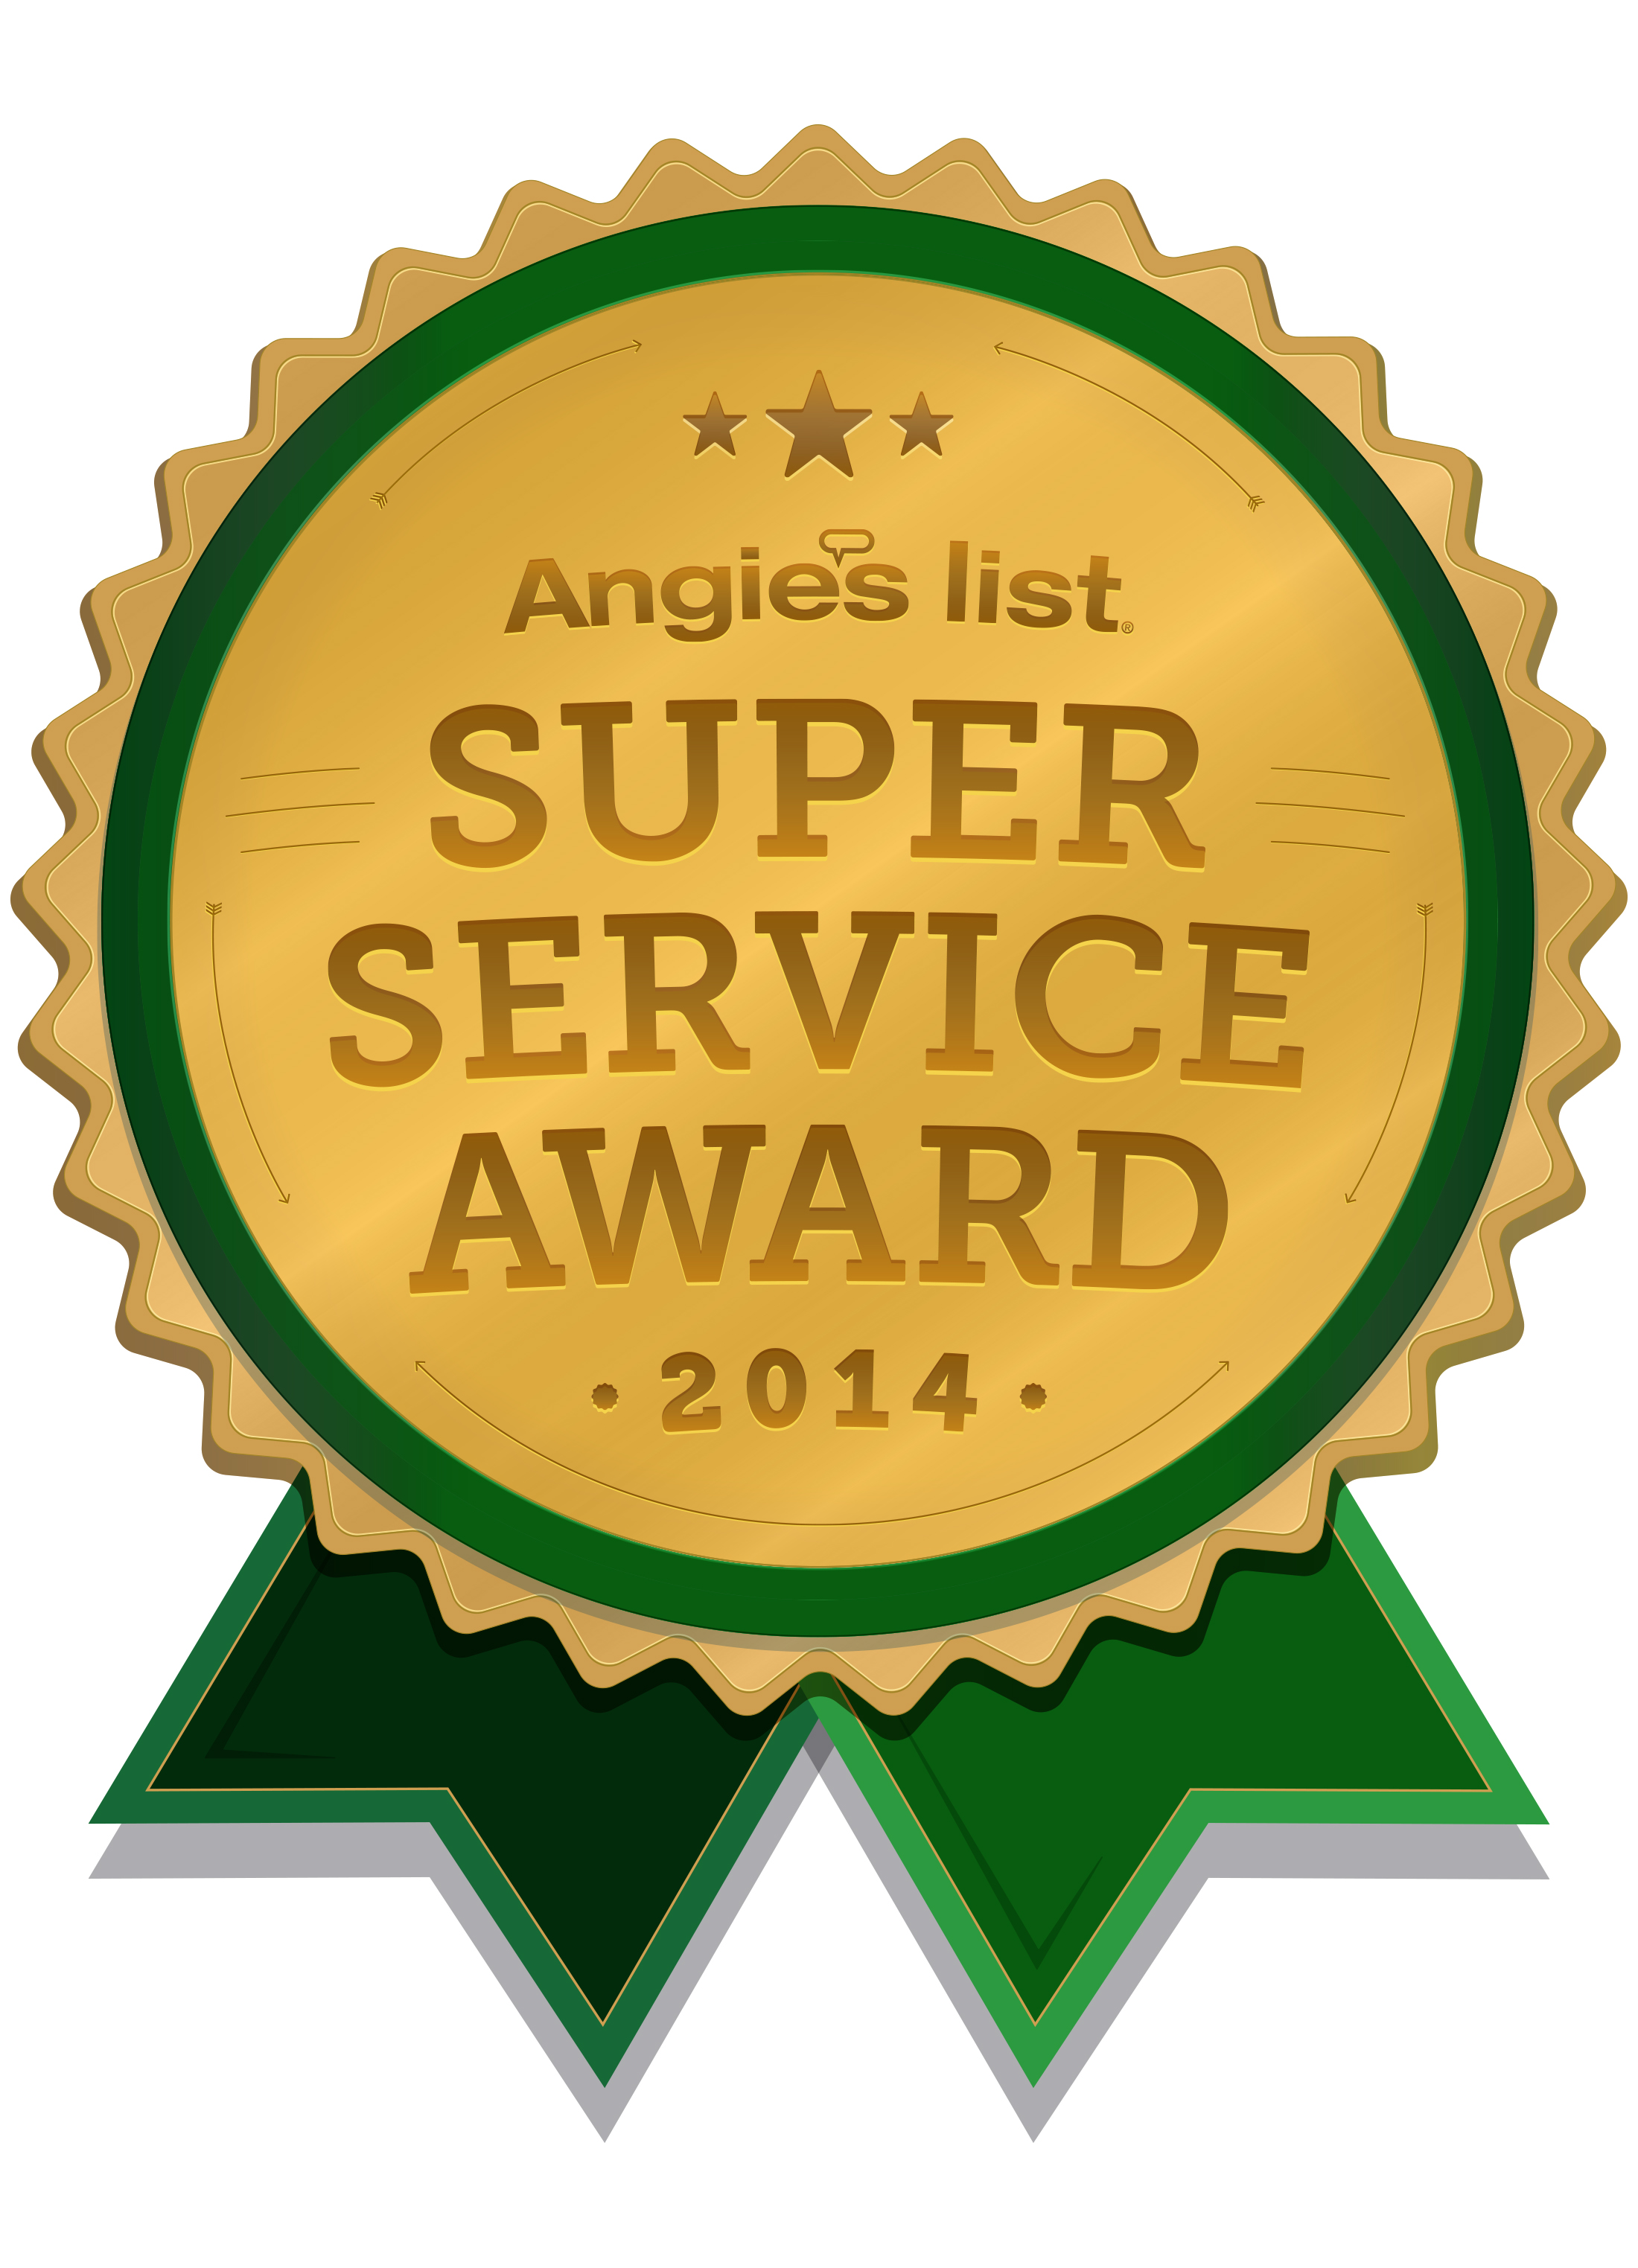 Angies_List_2014_Super_Service_Award